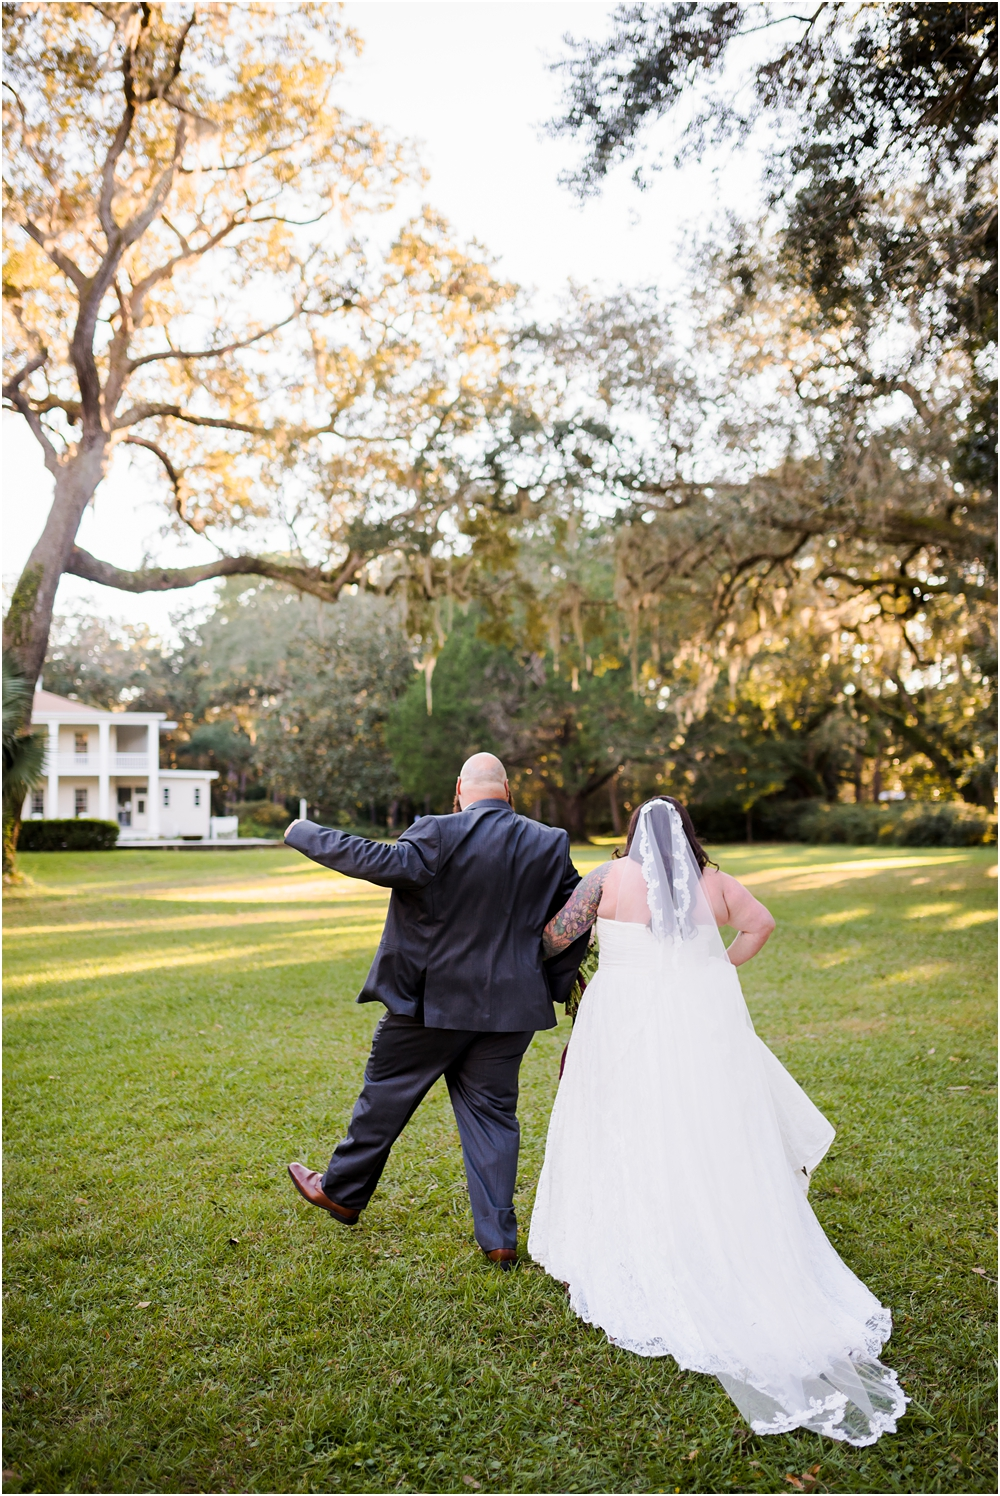 Eden-Gardens-florida-wedding-photographer-kiersten-stevenson-photography-77.jpg